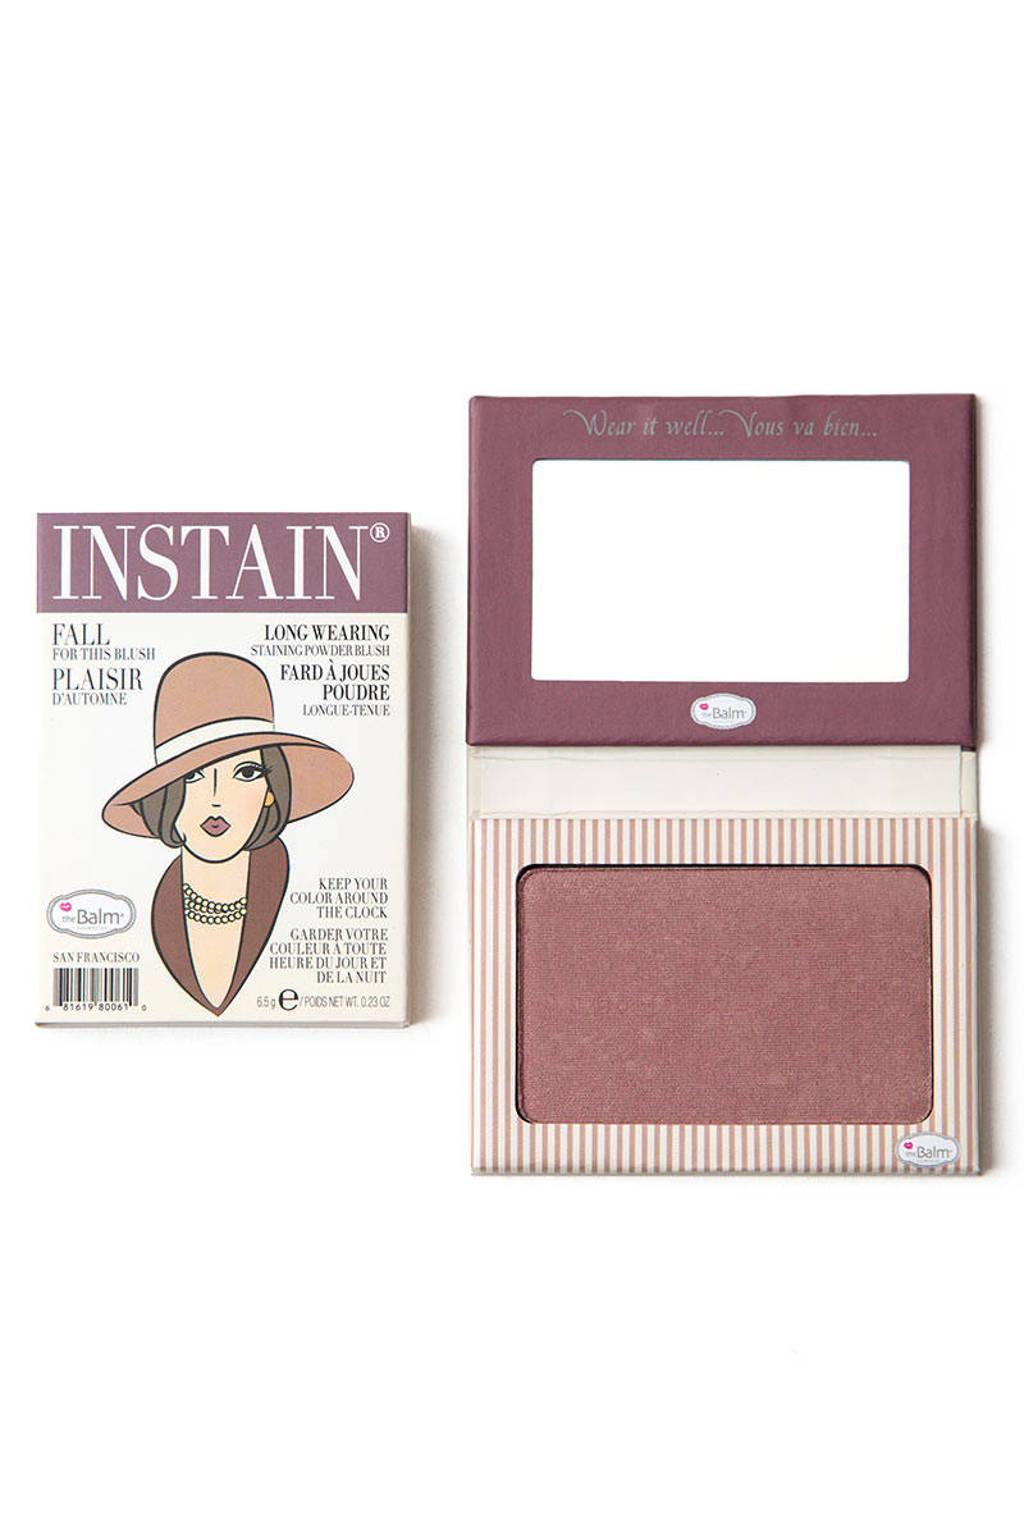 The Balm InStain blush - Pinstripe, Plum